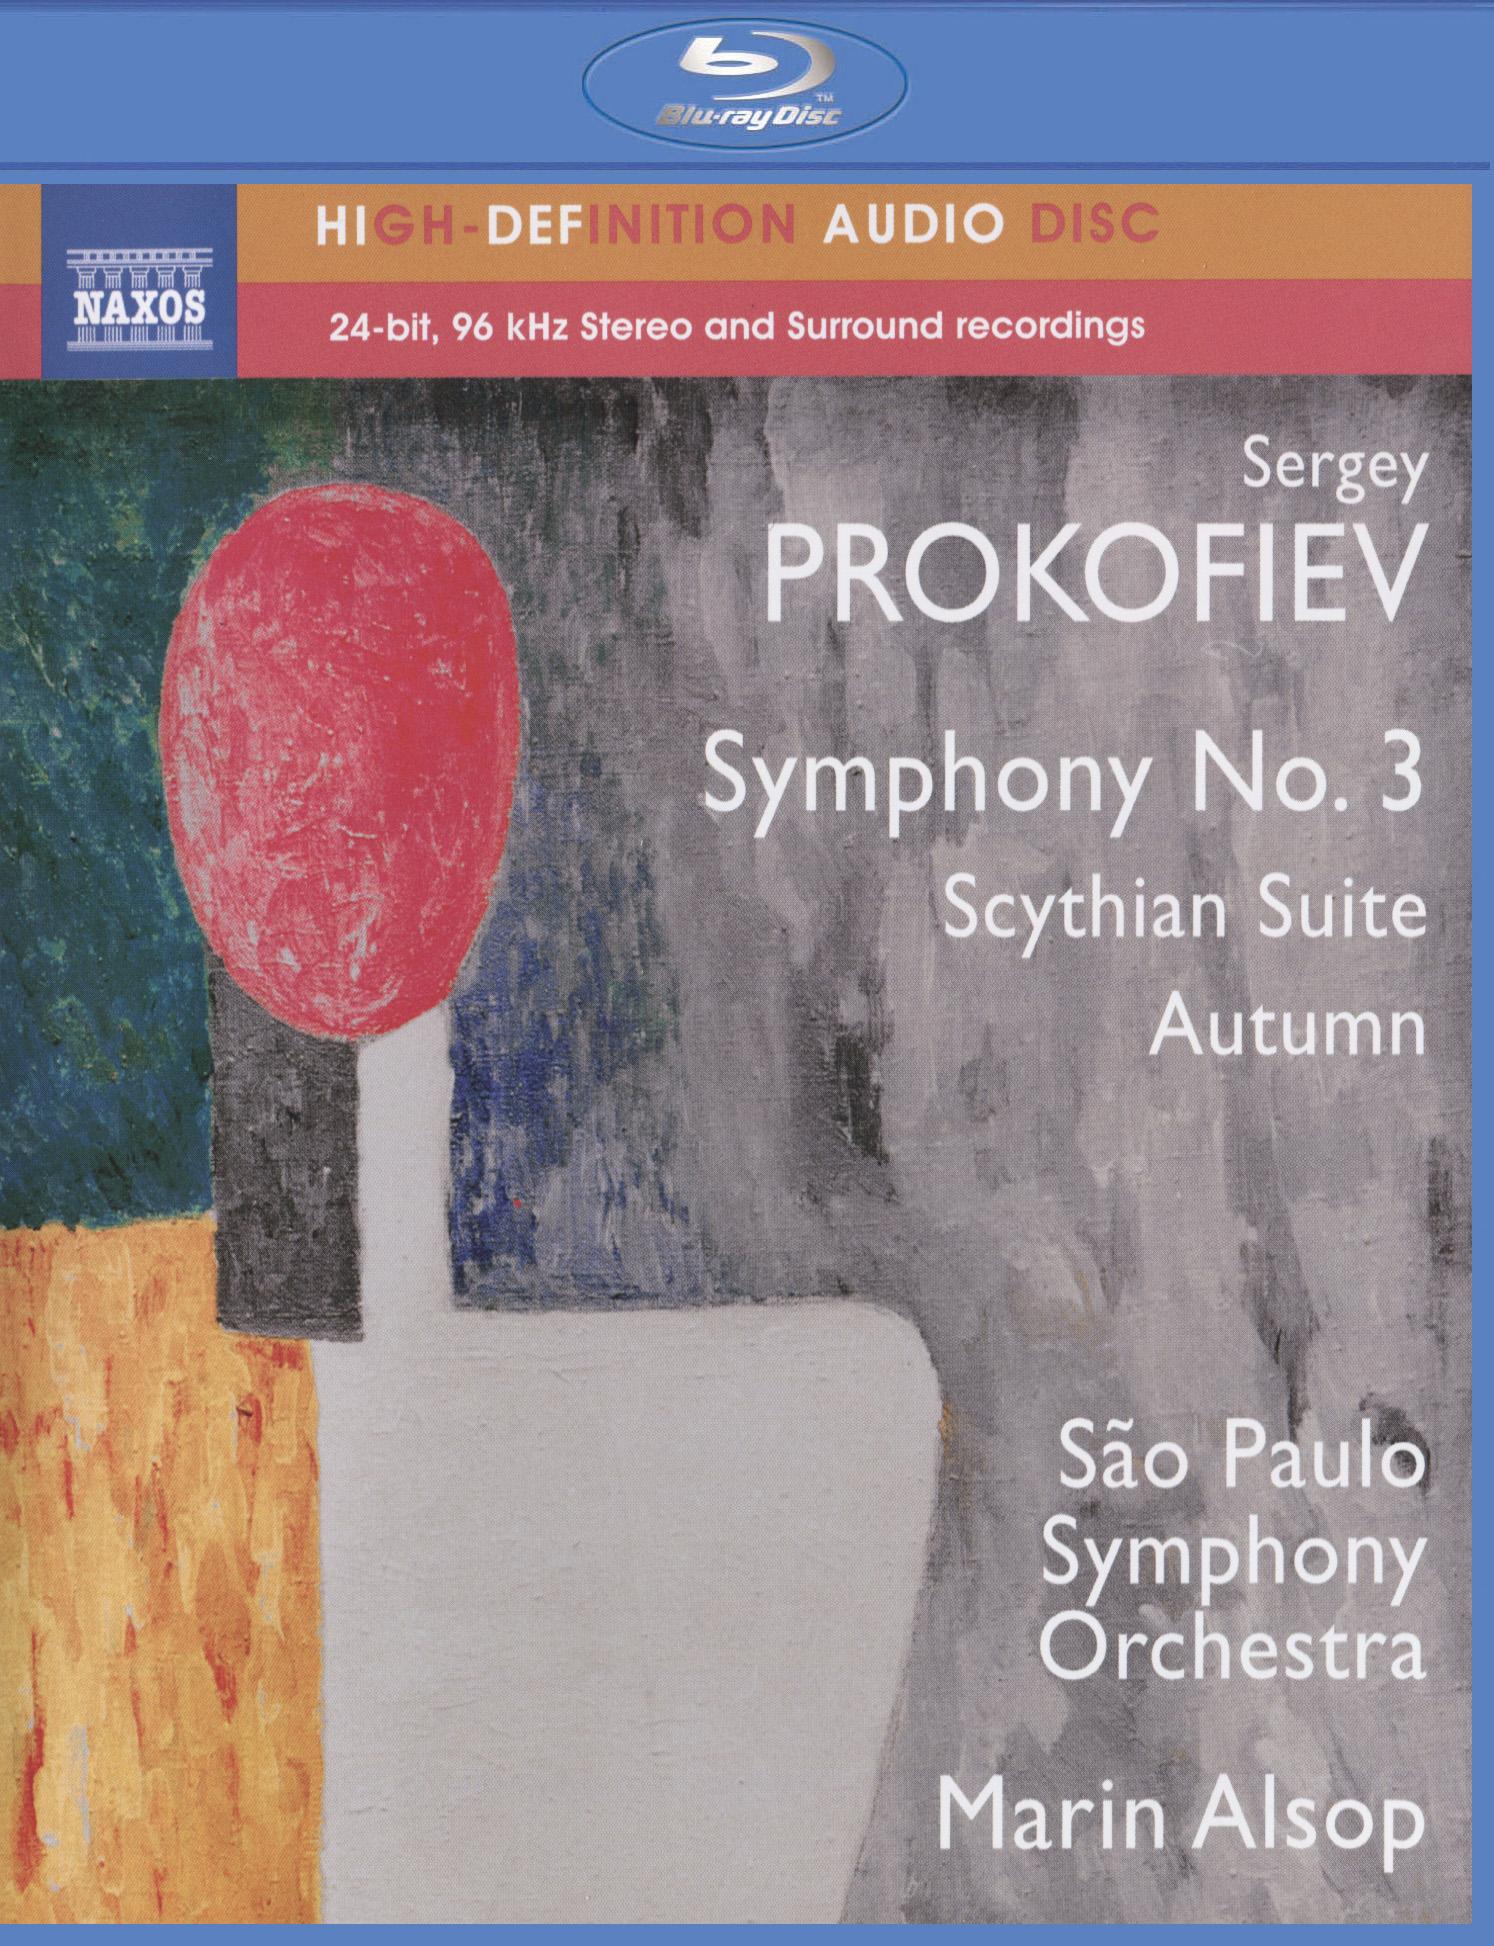 Prokofiev: Symphony No. 3/Scythian Suite/Autumn (2014)